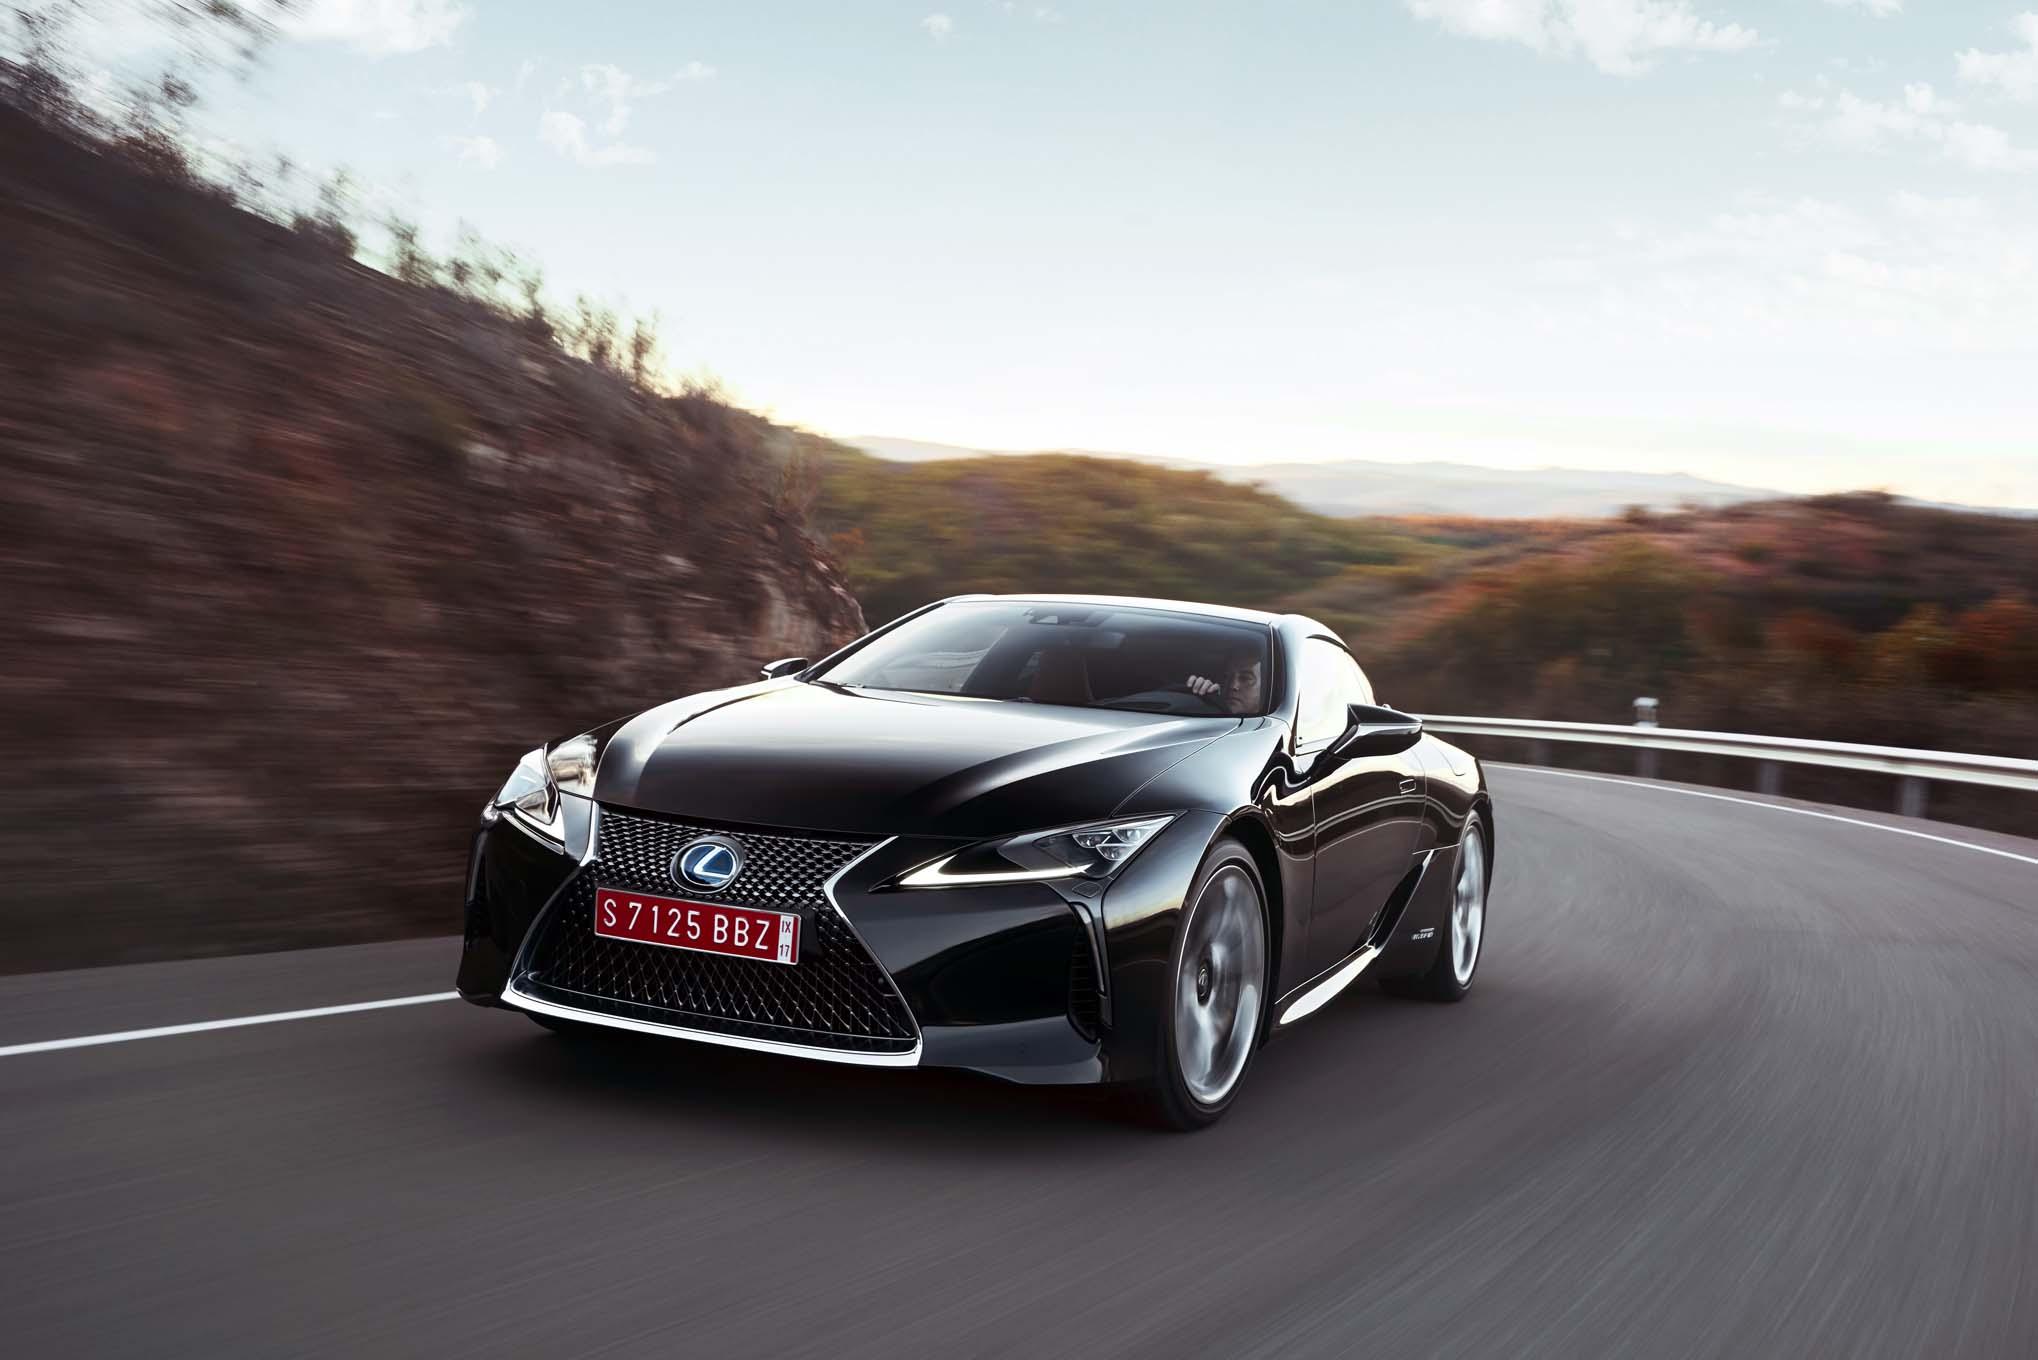 https://st.automobilemag.com/uploads/sites/11/2016/12/2018-Lexus-LC-500h-front-three-quarter-in-motion-09.jpg